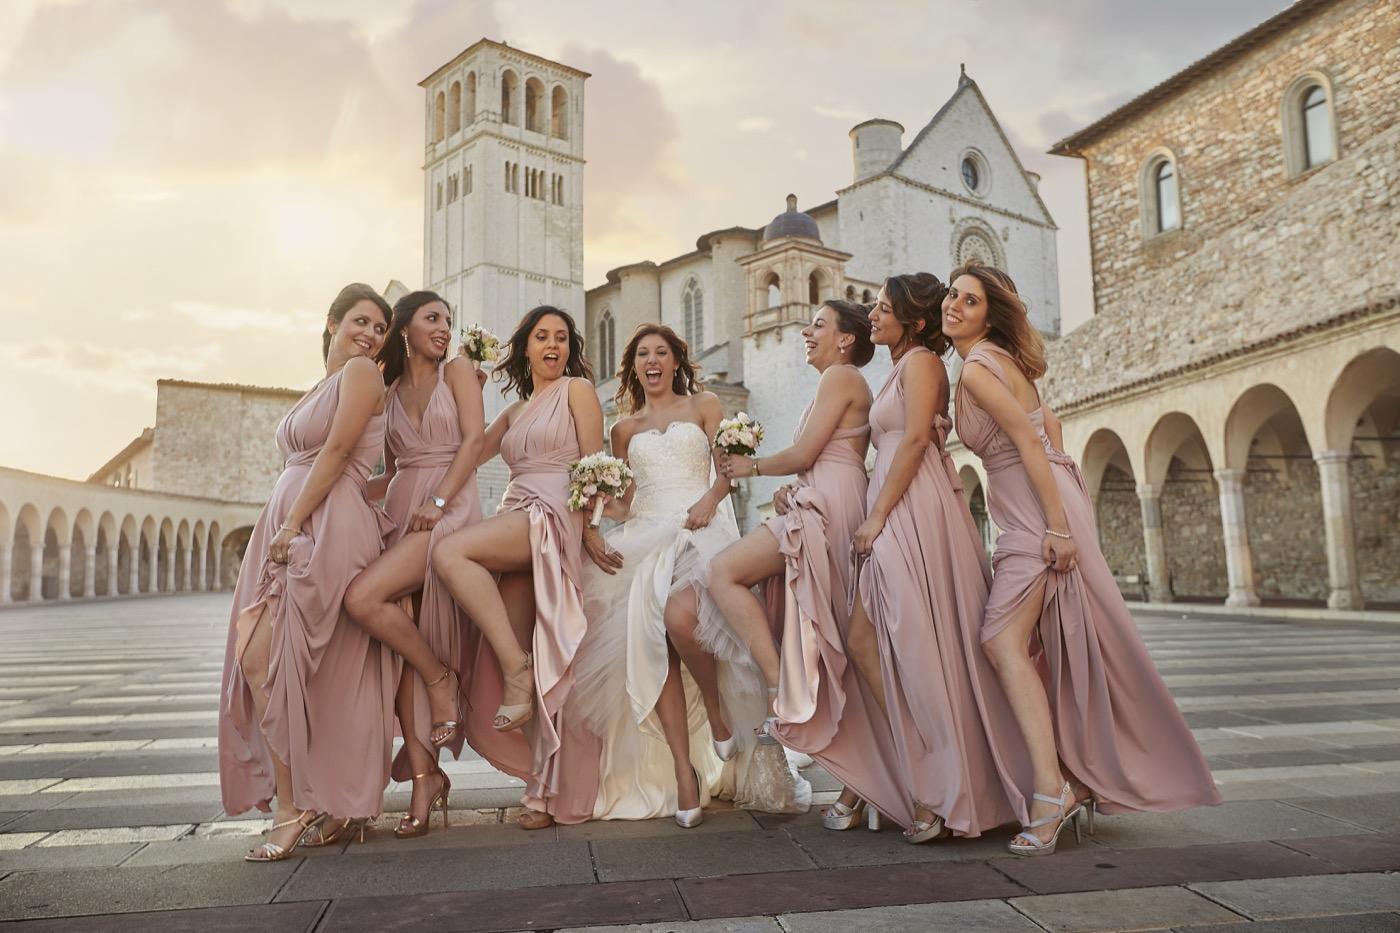 Claudio-Coppola-wedding-photographer-abbazia-7-frati-piegaro-84